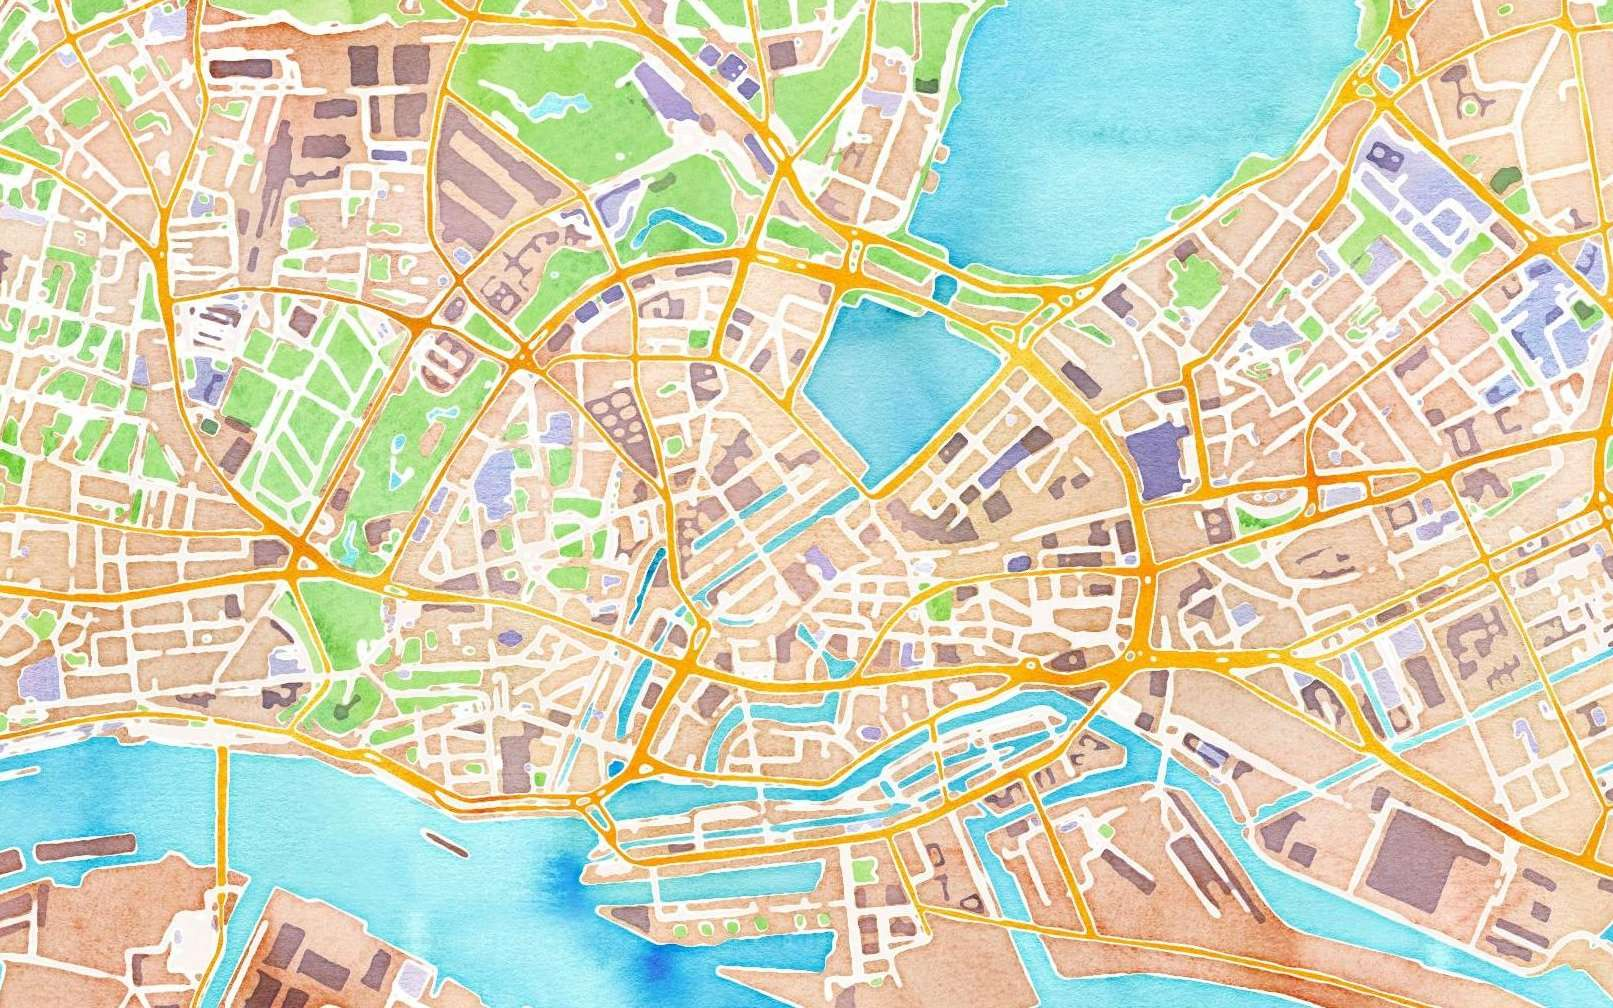 Hingergrundbild, Karte der Hamburger Innenstadt im Aquarell-Stil